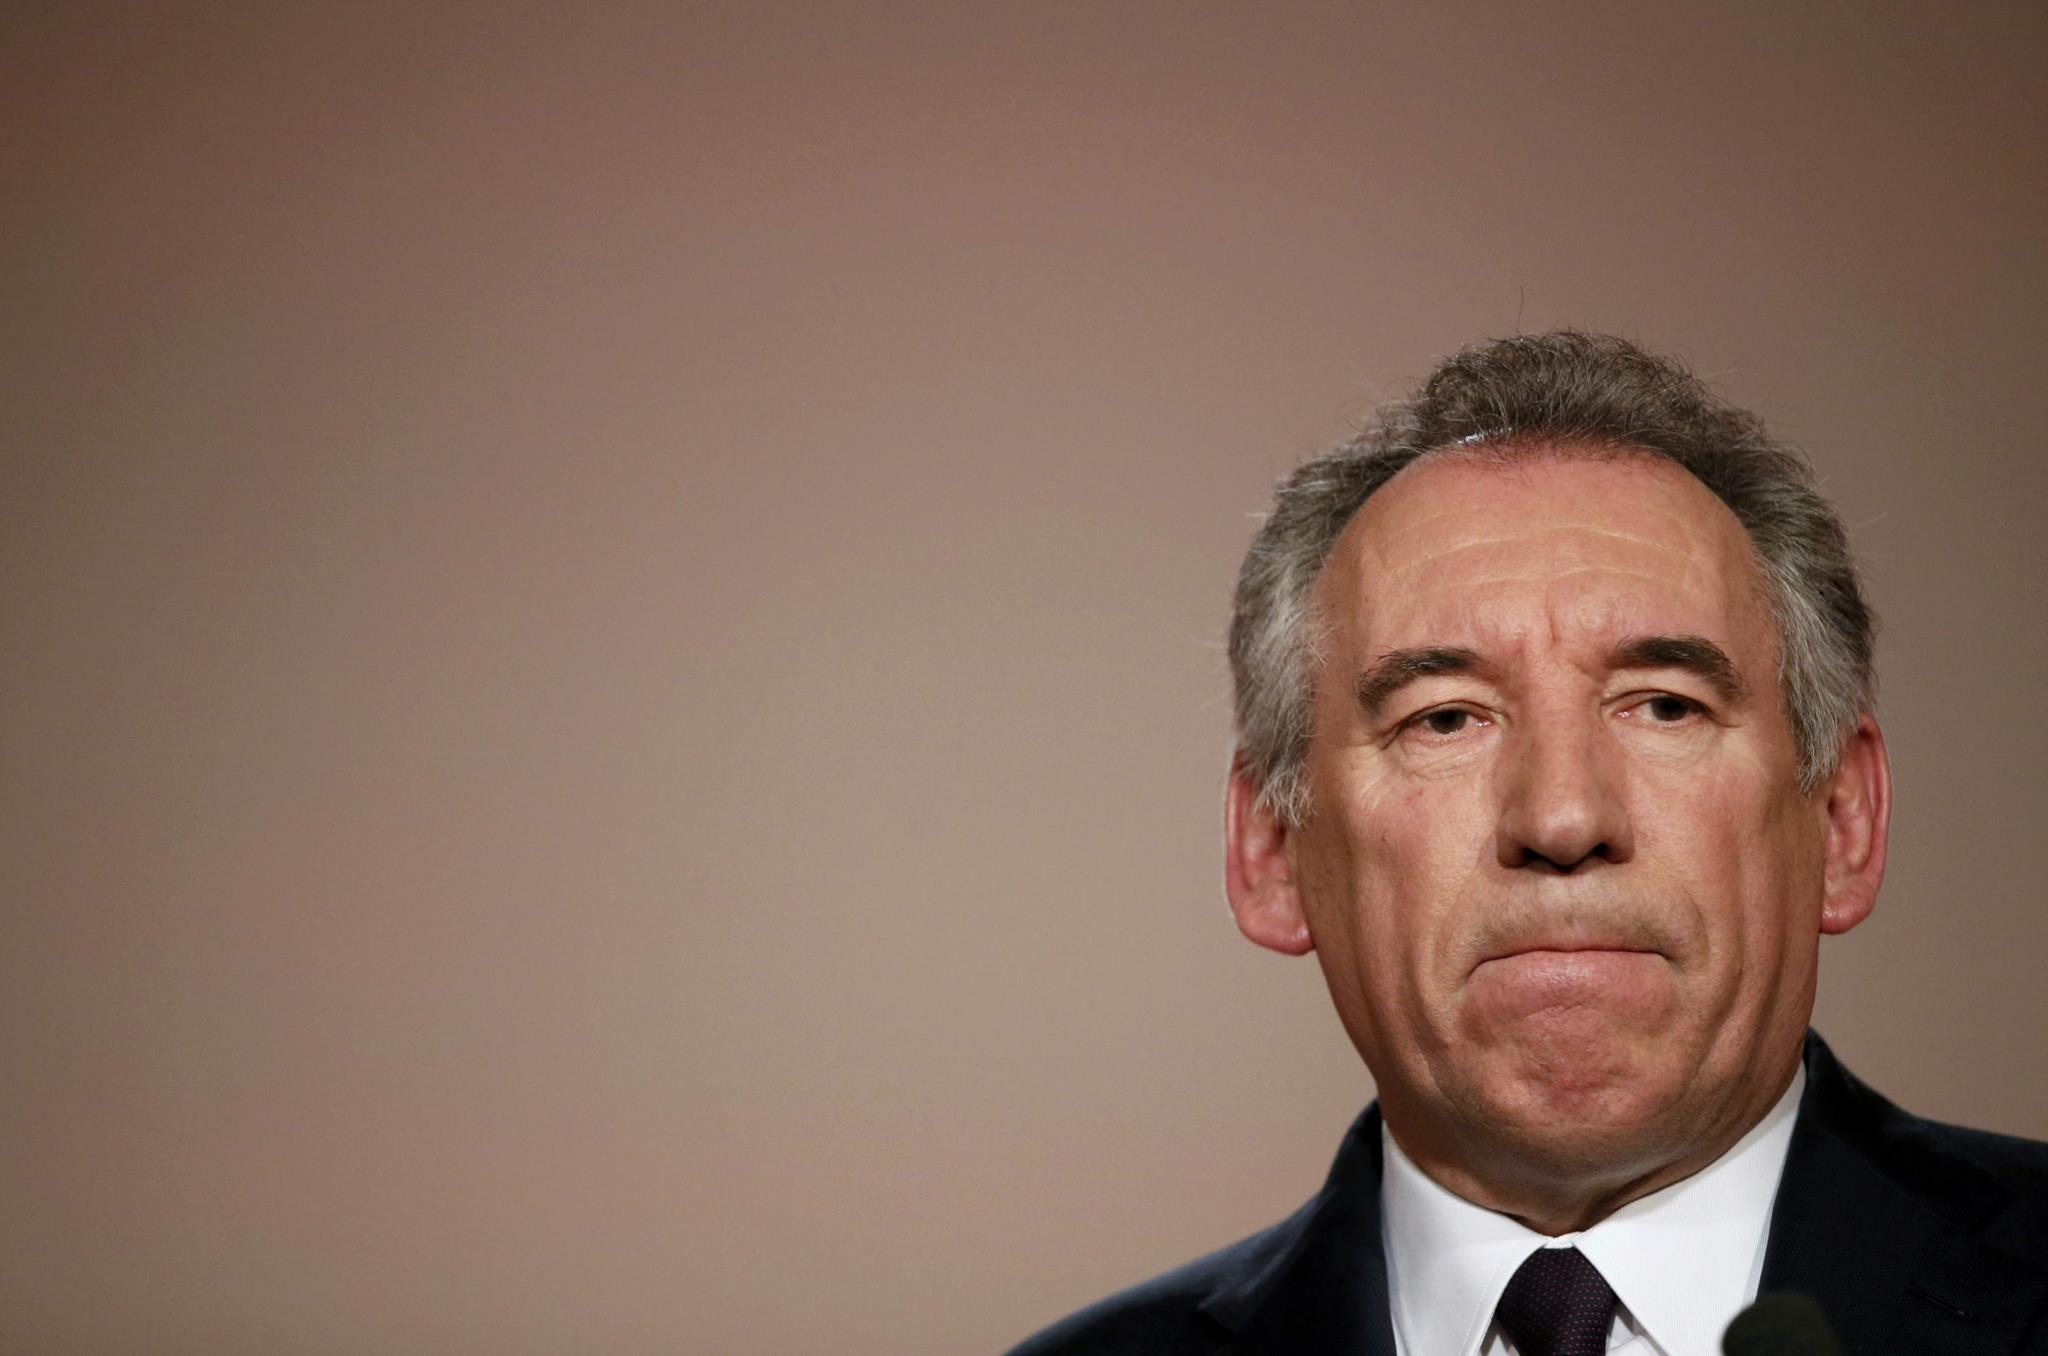 PÚBLICO - Macron aceita aliança proposta pelo centrista Bayrou